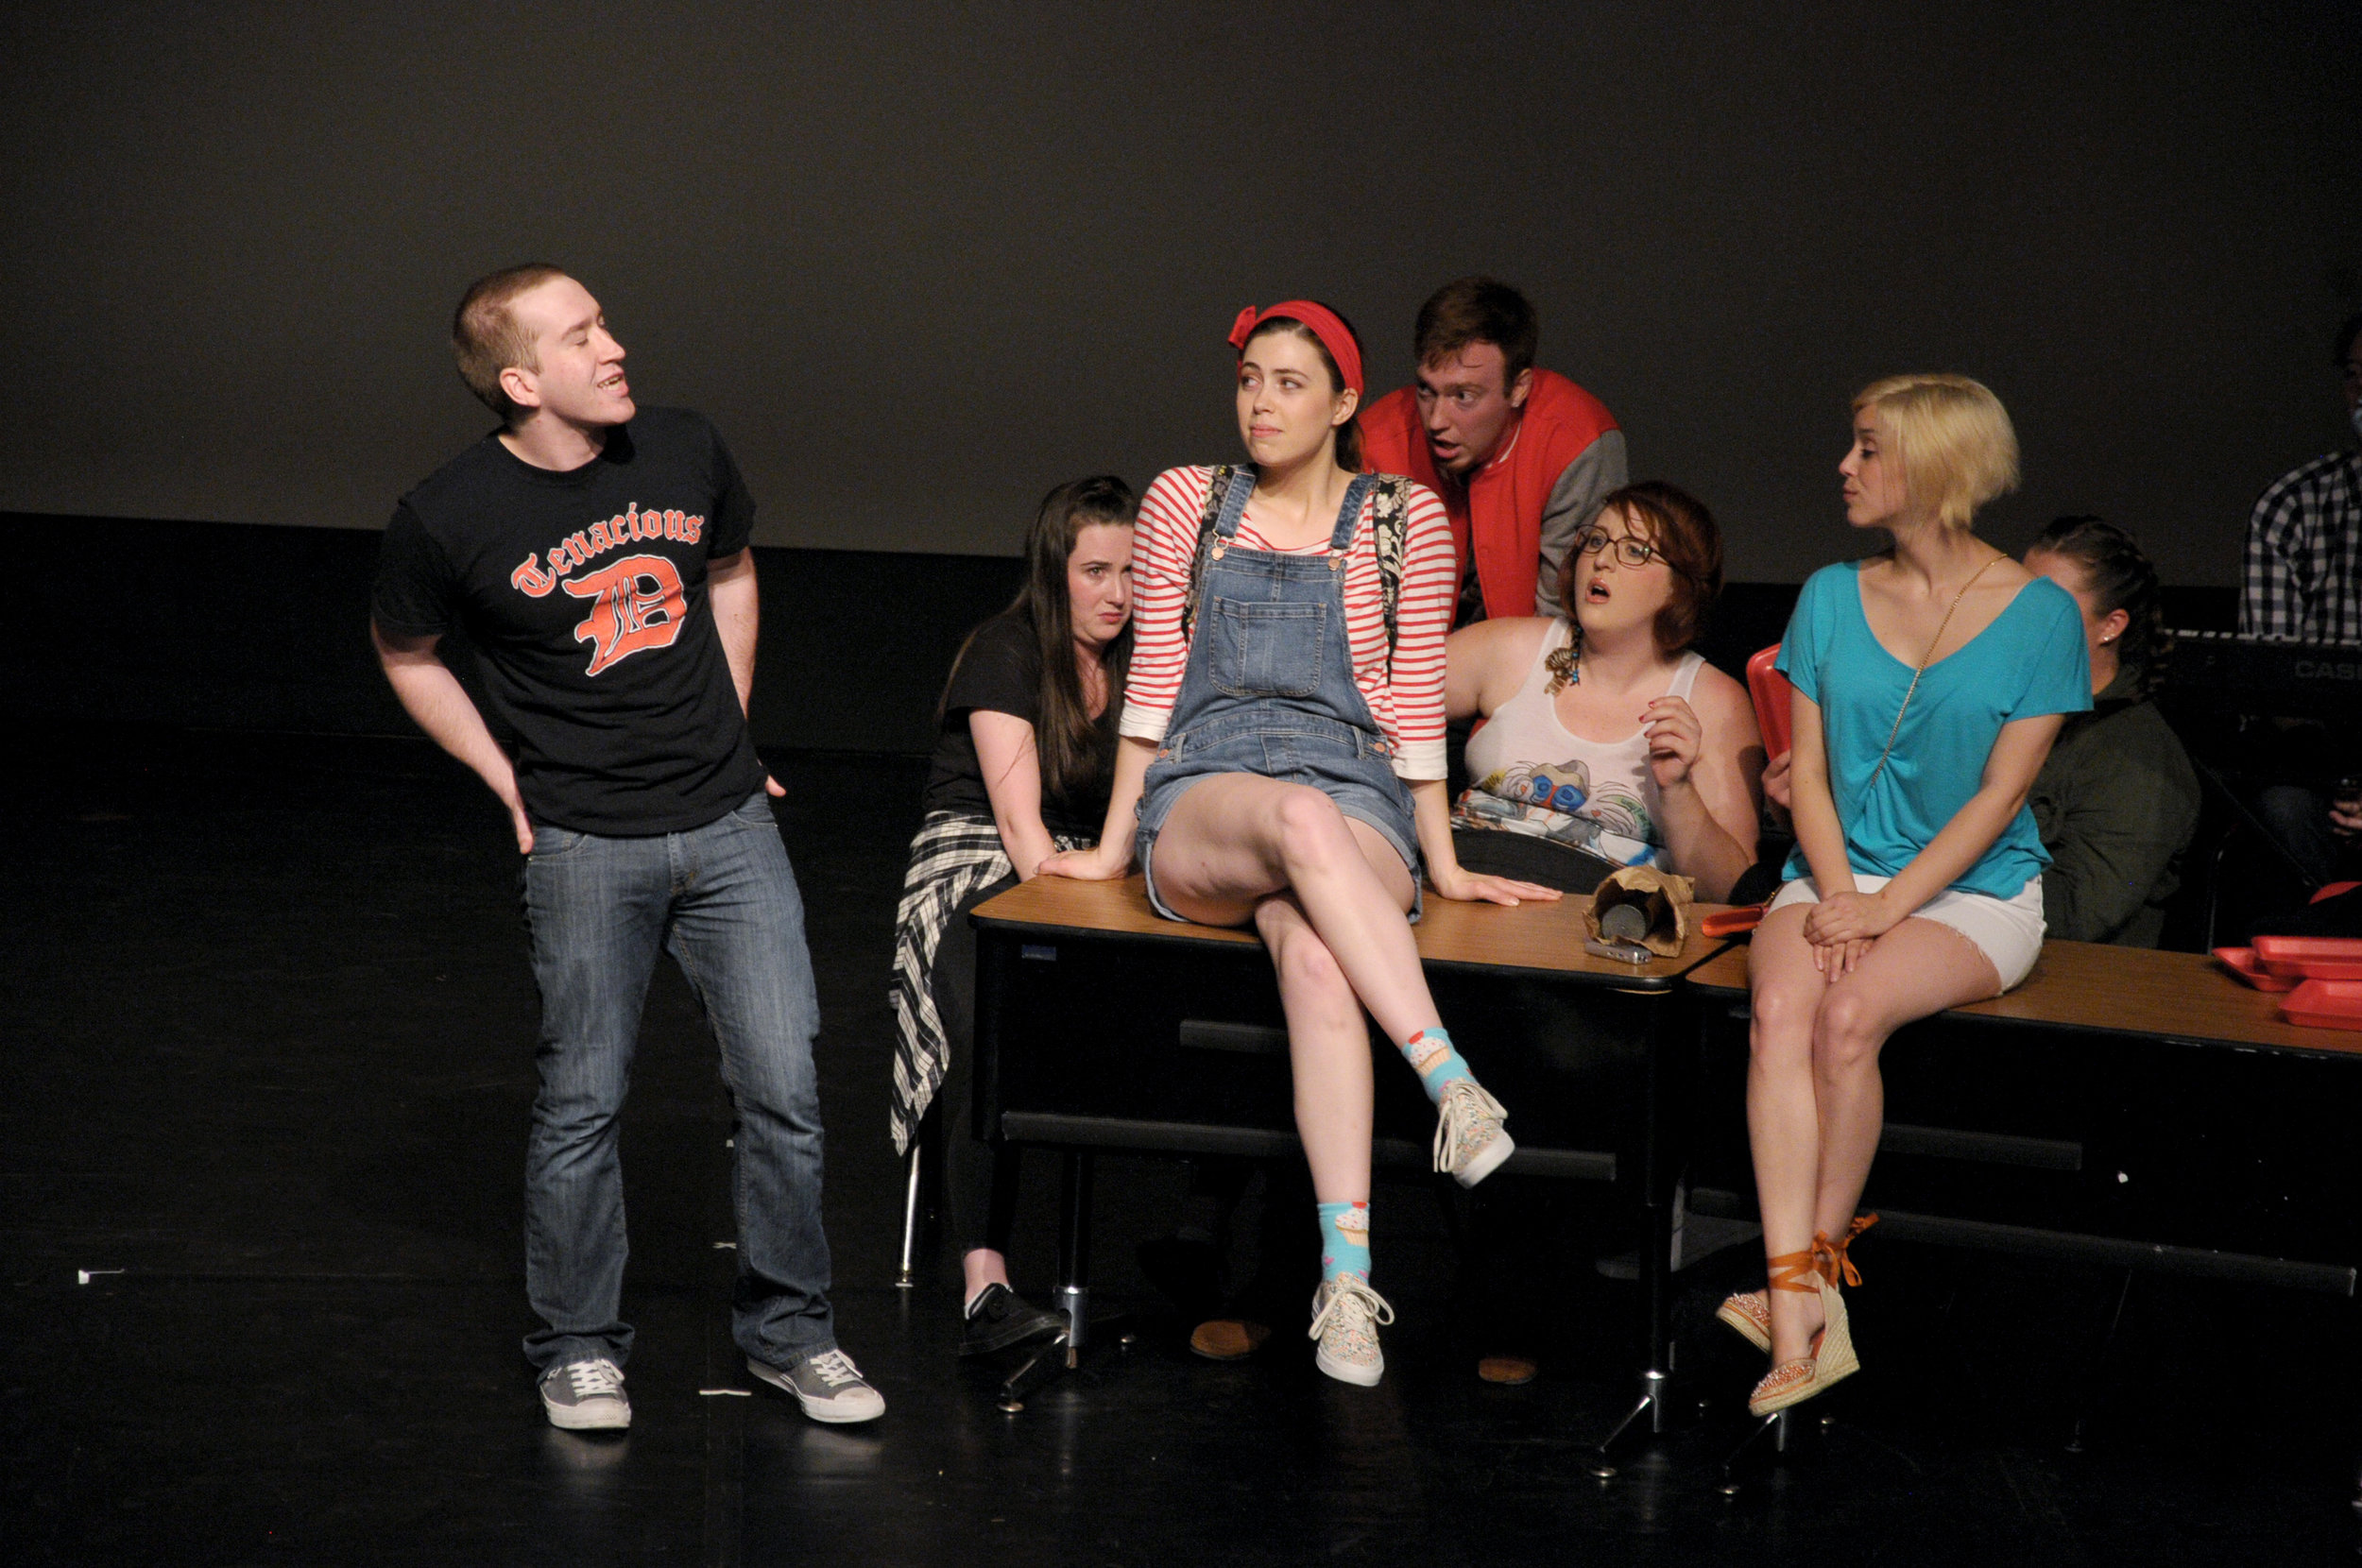 Dylan Hares (Devon), Tess Higgins (Olivia), Aaron Sulkin (Wayne), Katie Brunberg (Veronica), and Brittany Martz (Peyton)